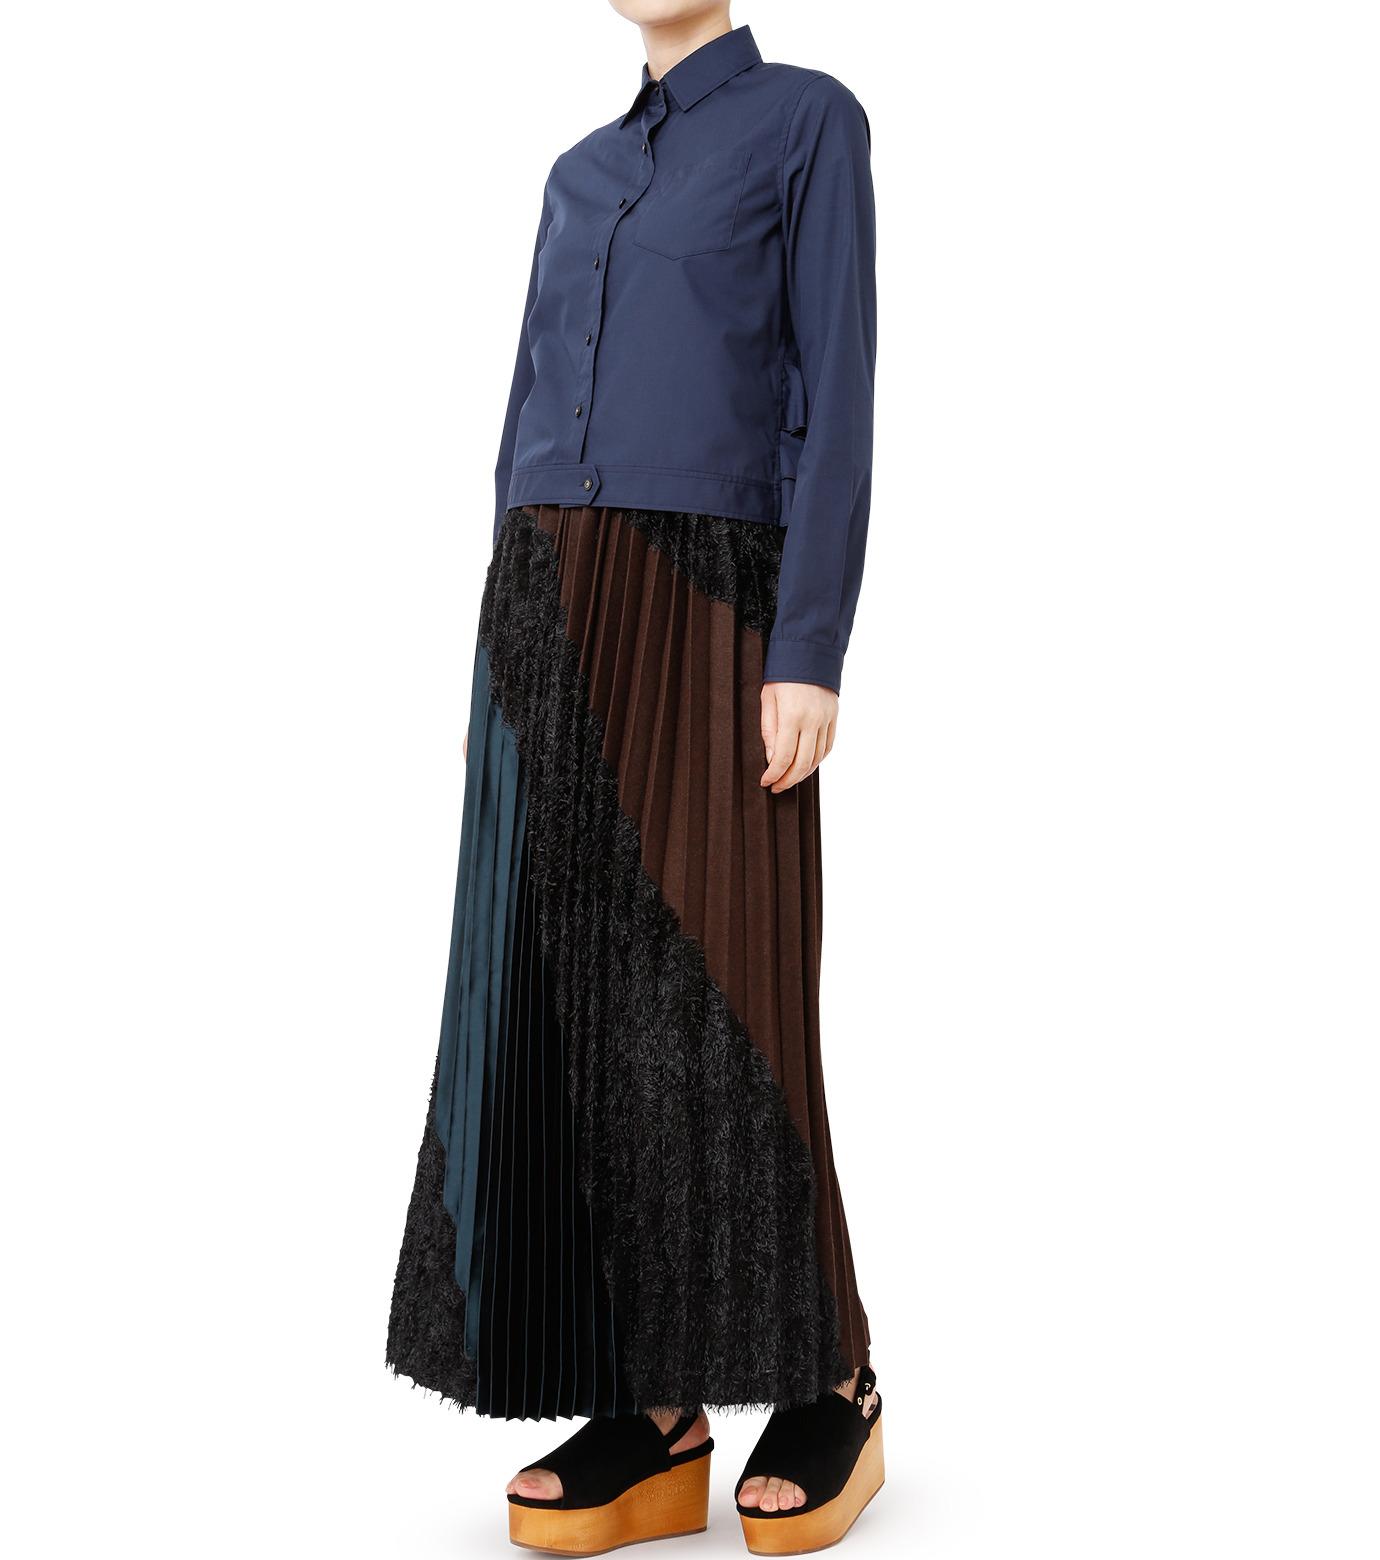 KOLOR(カラー)のLong Pleated Skirt Mixed Jacquard-BLACK(スカート/skirt)-16WCL-S03129-13 拡大詳細画像3